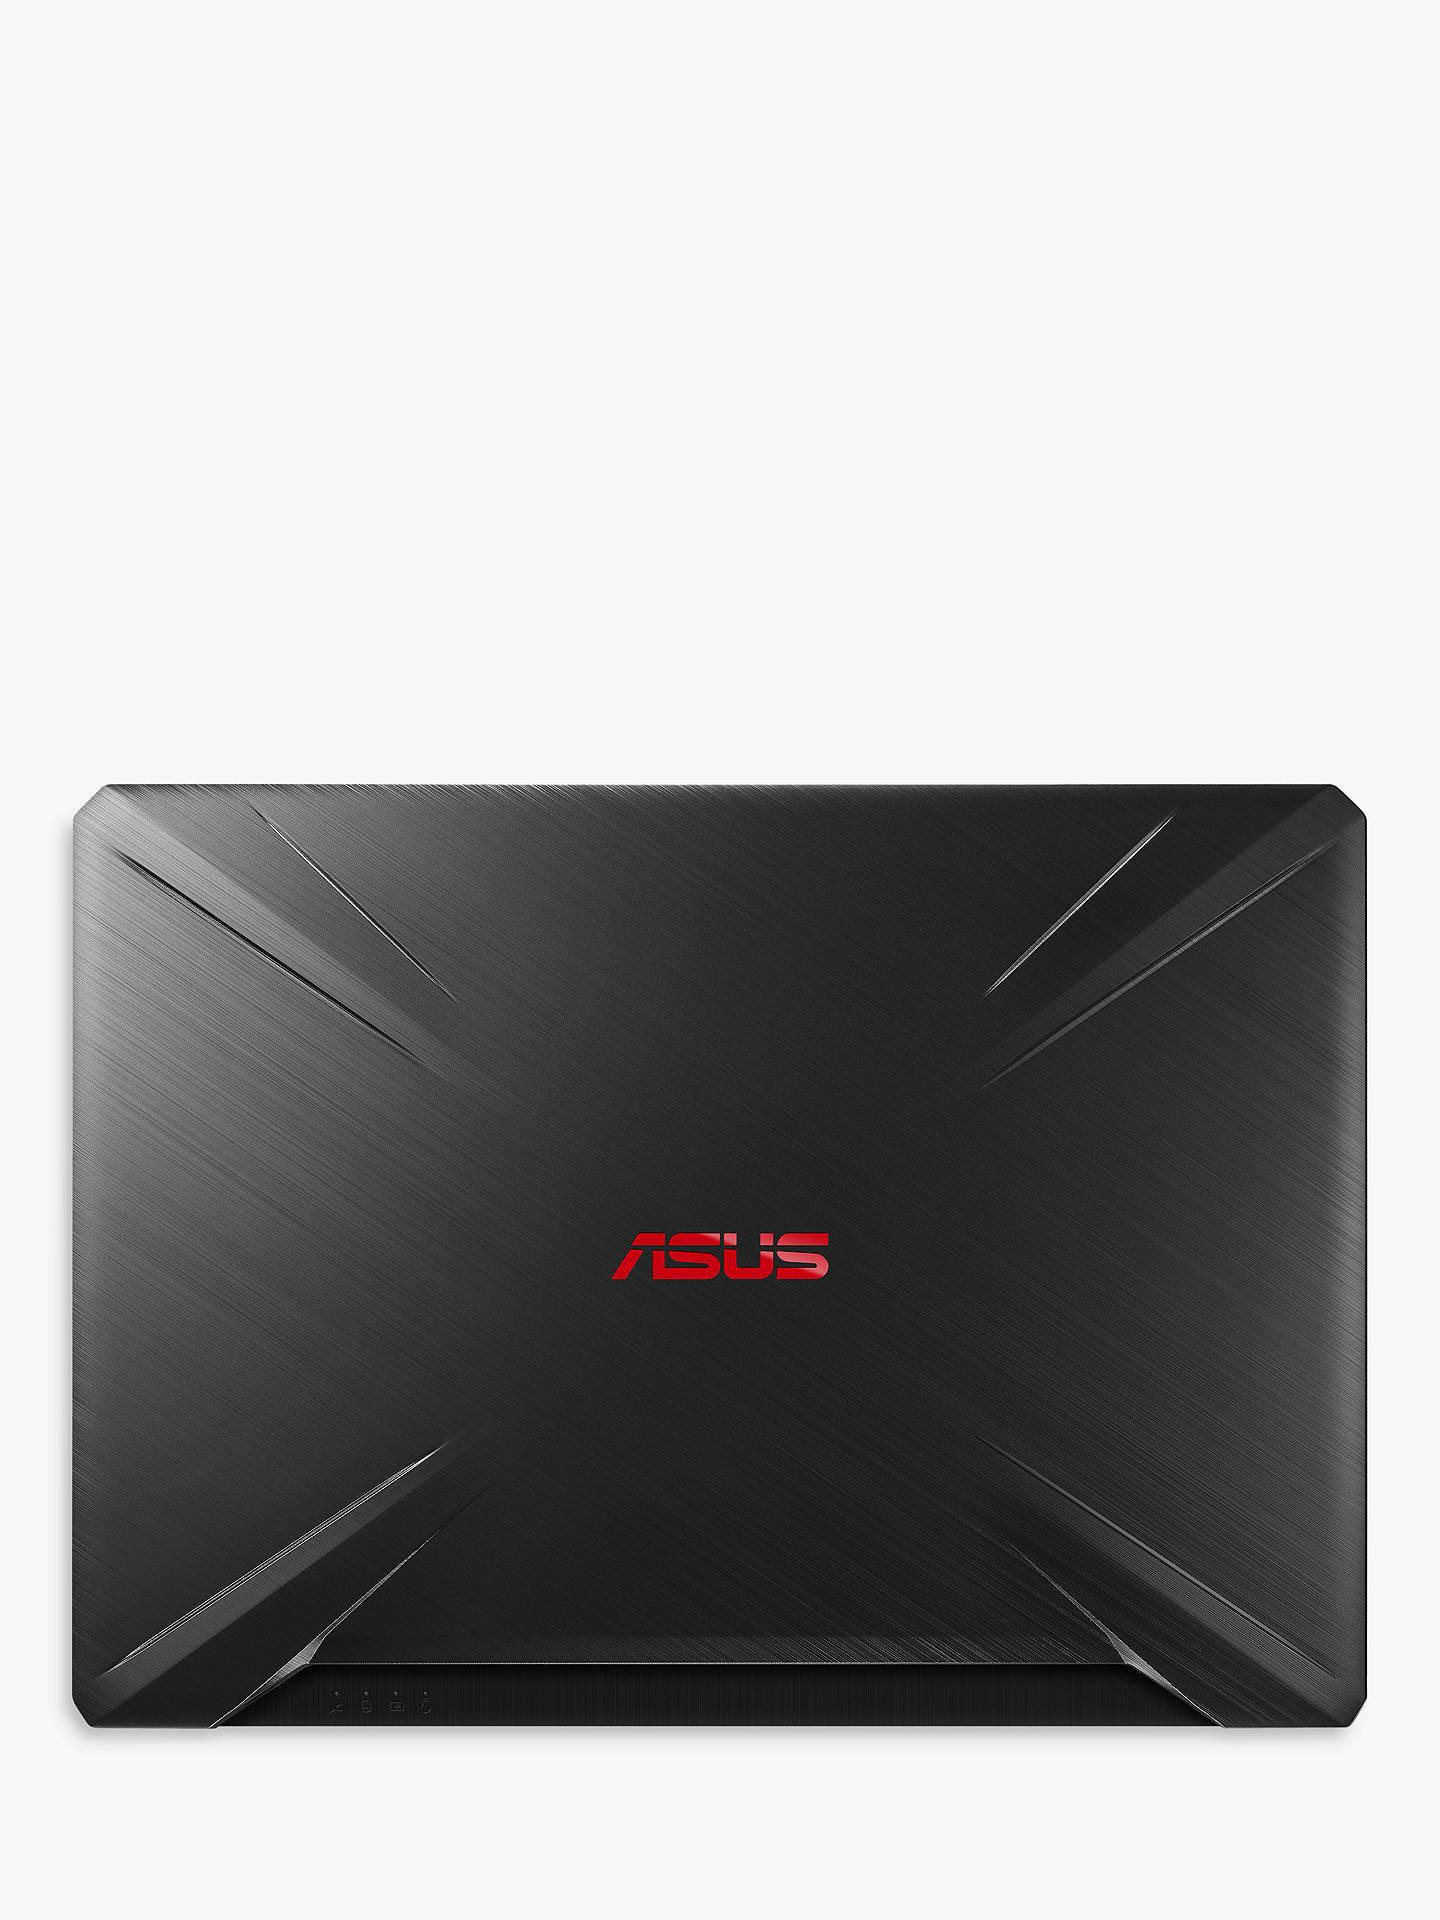 ASUS FX505 Laptop, AMD Ryzen R5 Processor, 8GB RAM, 1TB HDD + 256GB SSD,  Radeon RX 560, 15 6